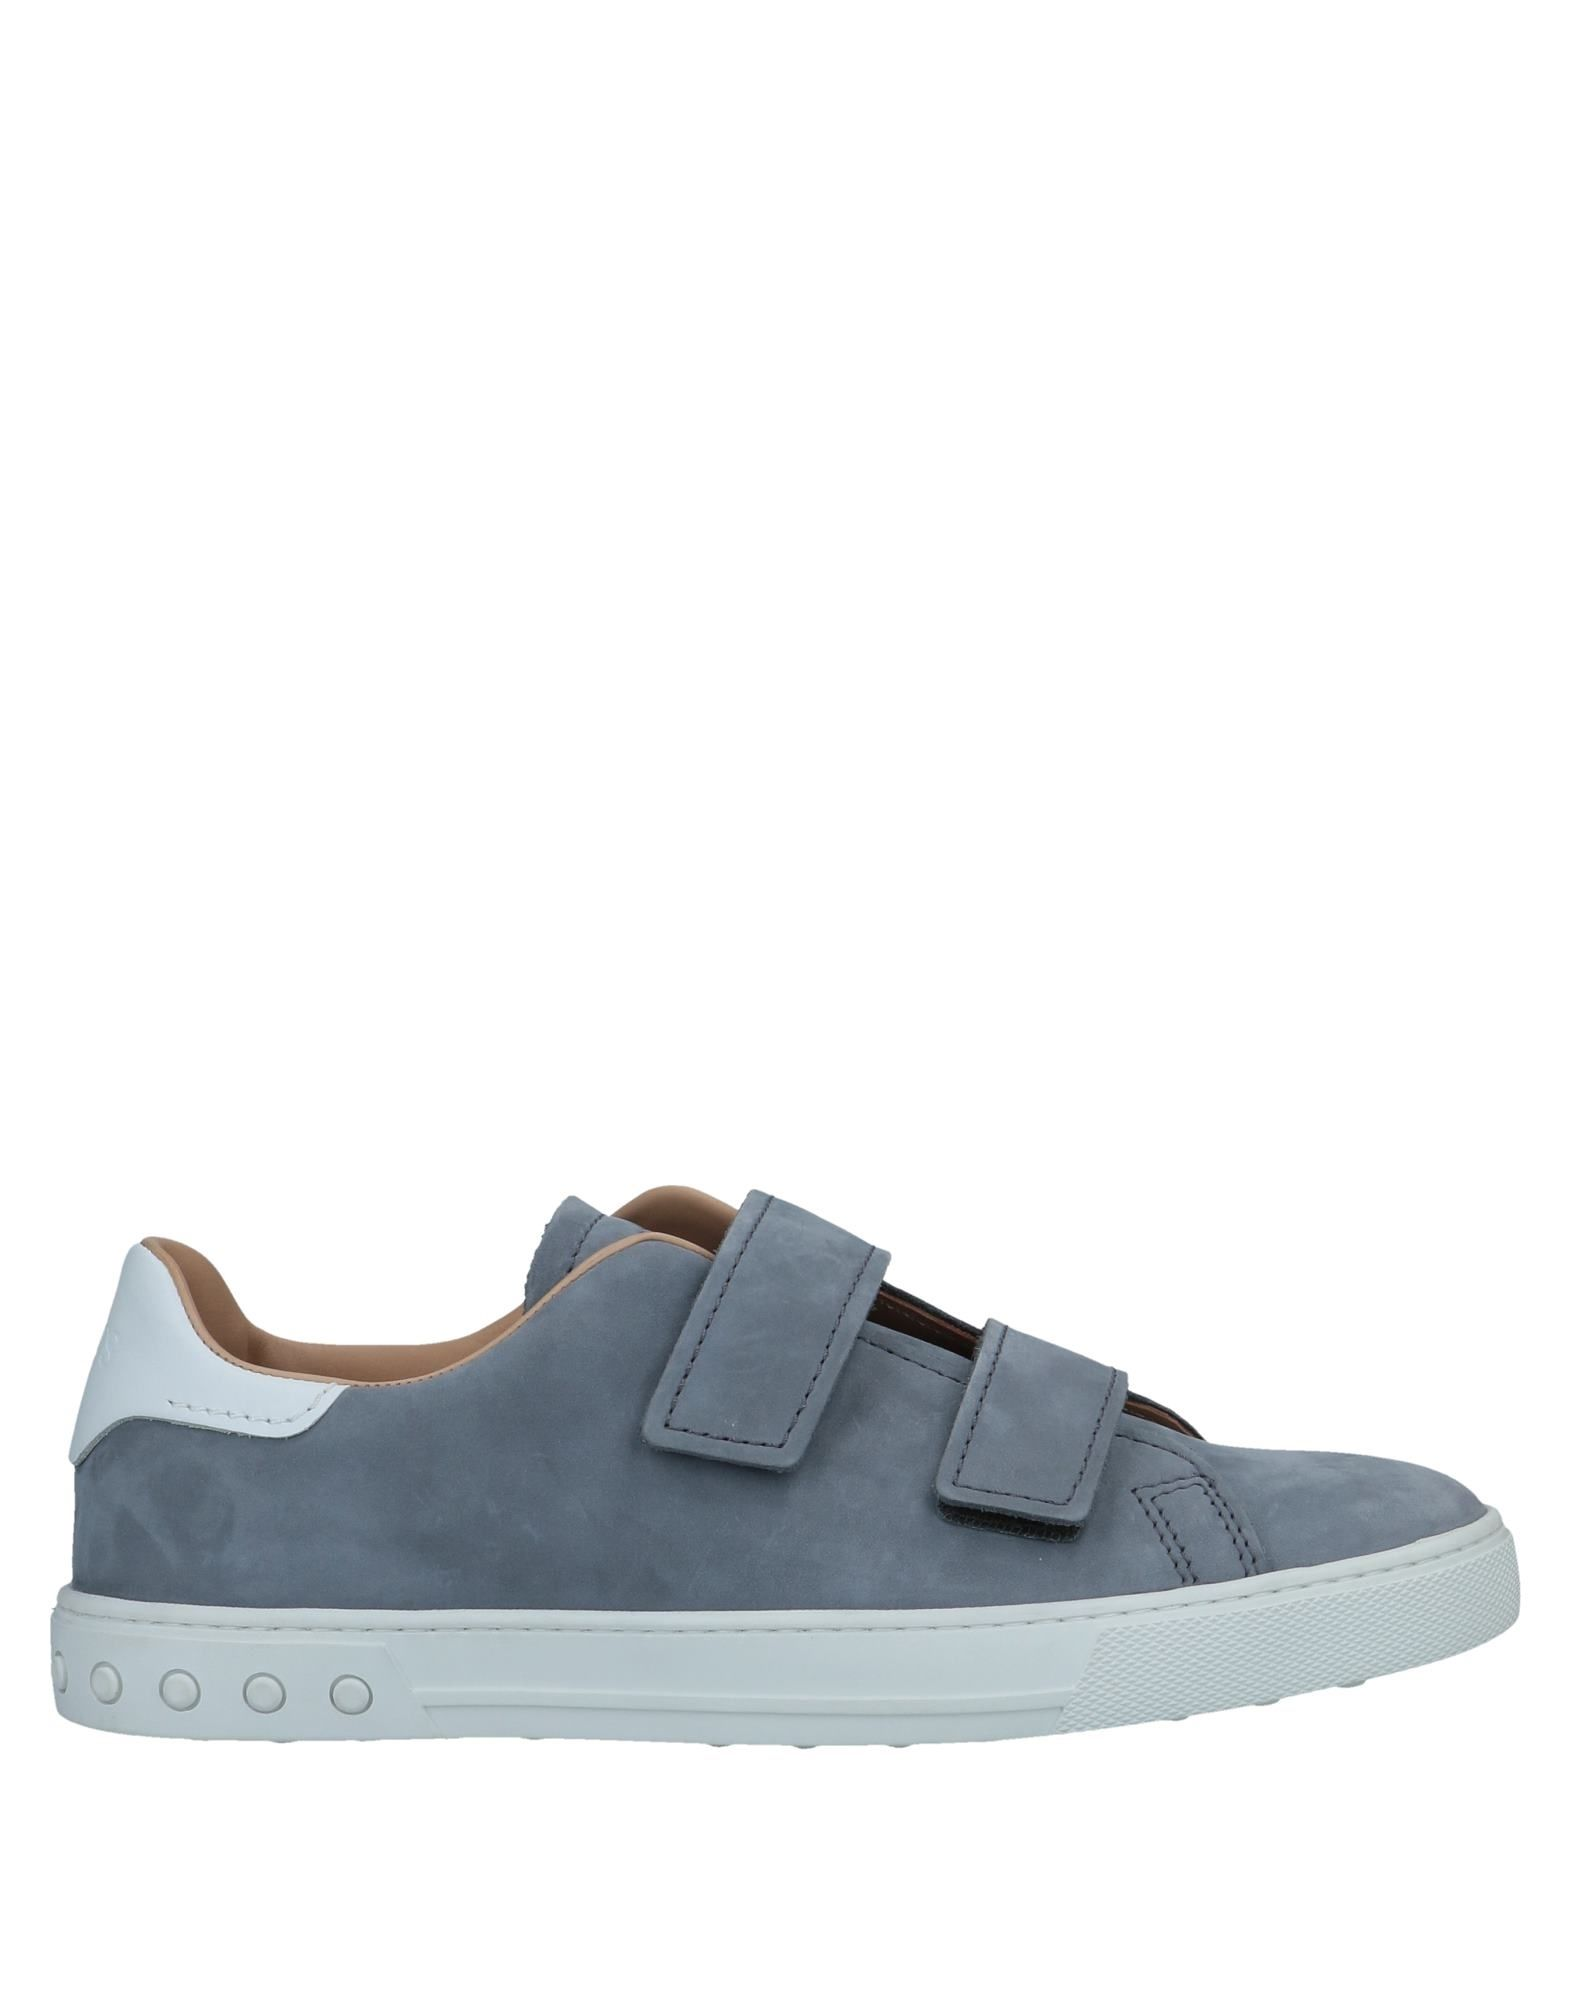 Tod's Sneakers Herren  11370403QP Gute Qualität beliebte Schuhe